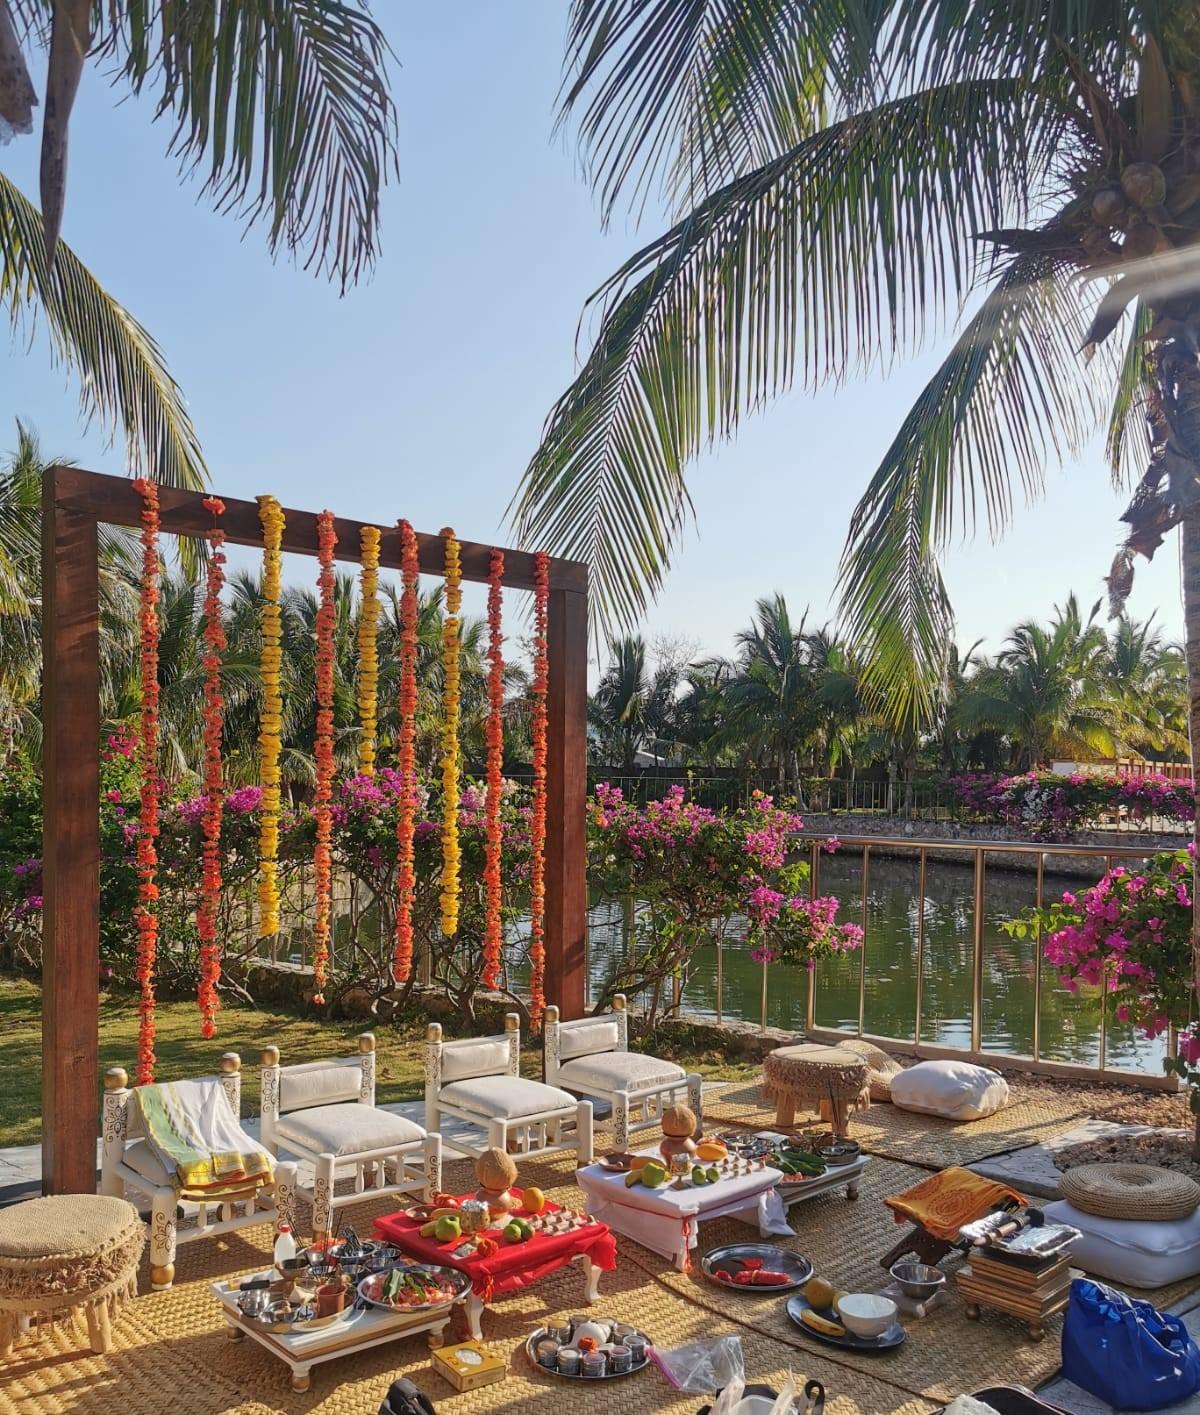 Pithi_frida_garden_terrace